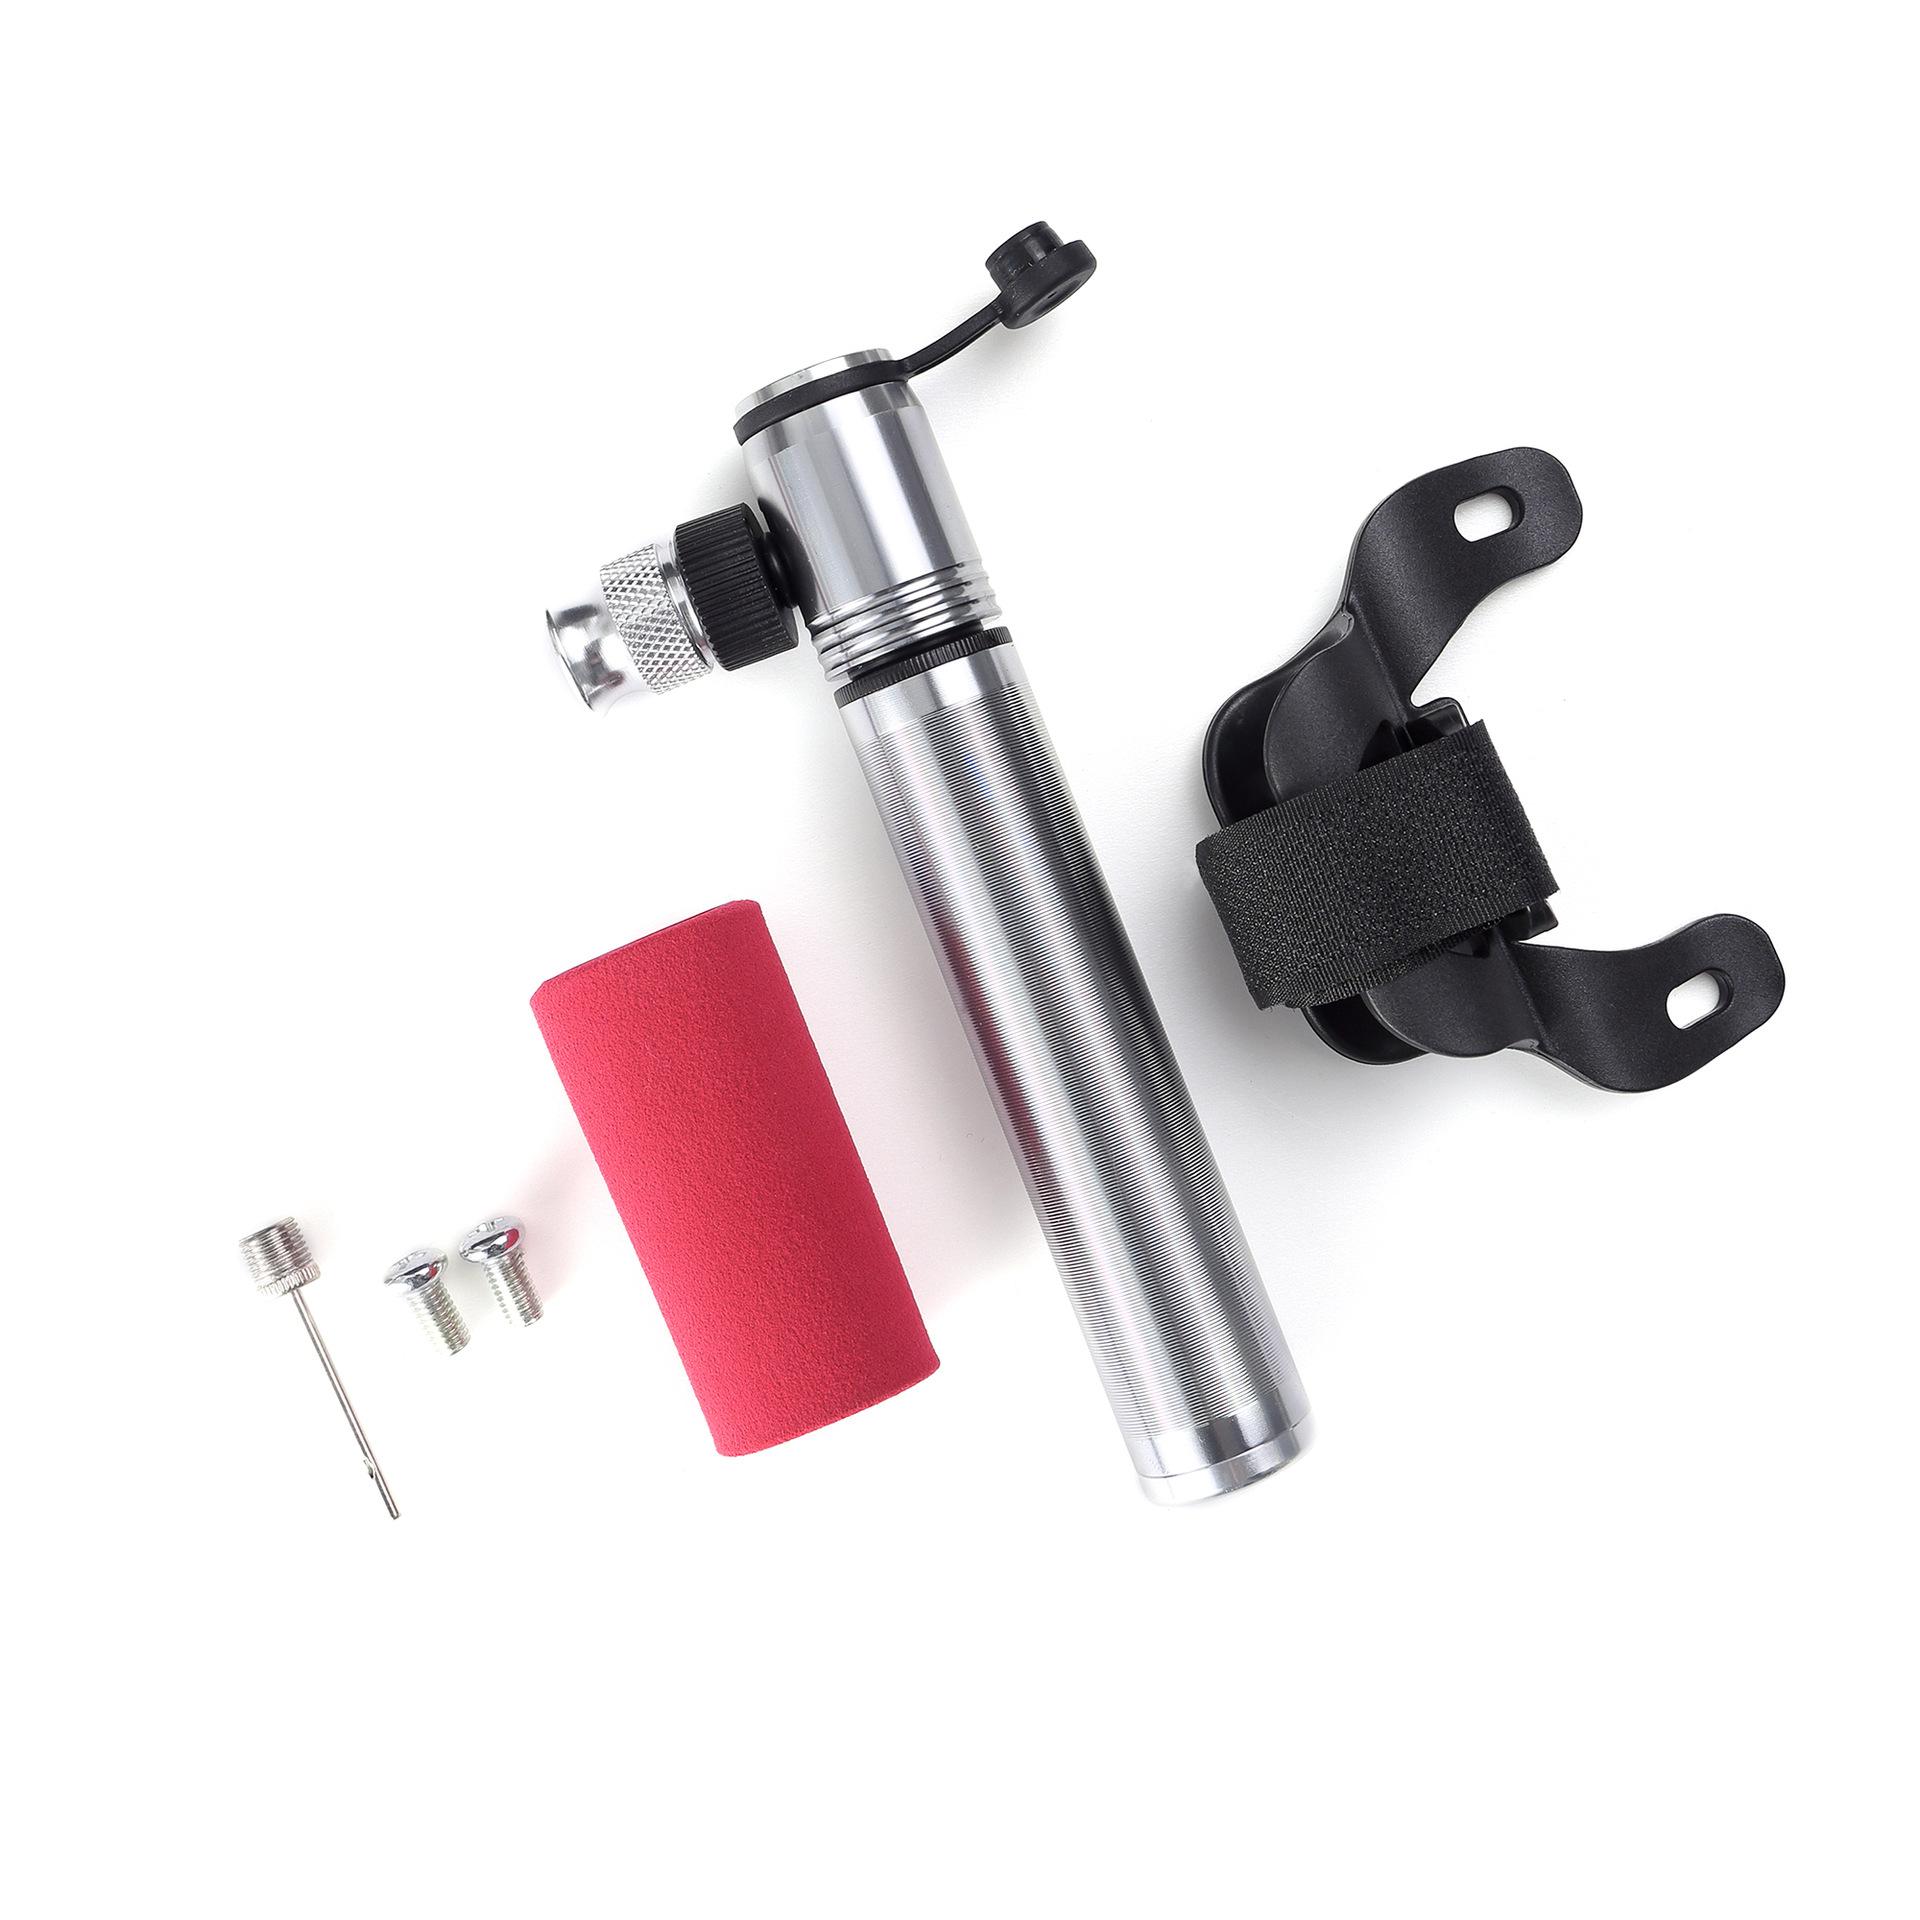 Mini Portable Bicycle Air Pump Air needle + Bracket + Screw Pumping Tool  Silver